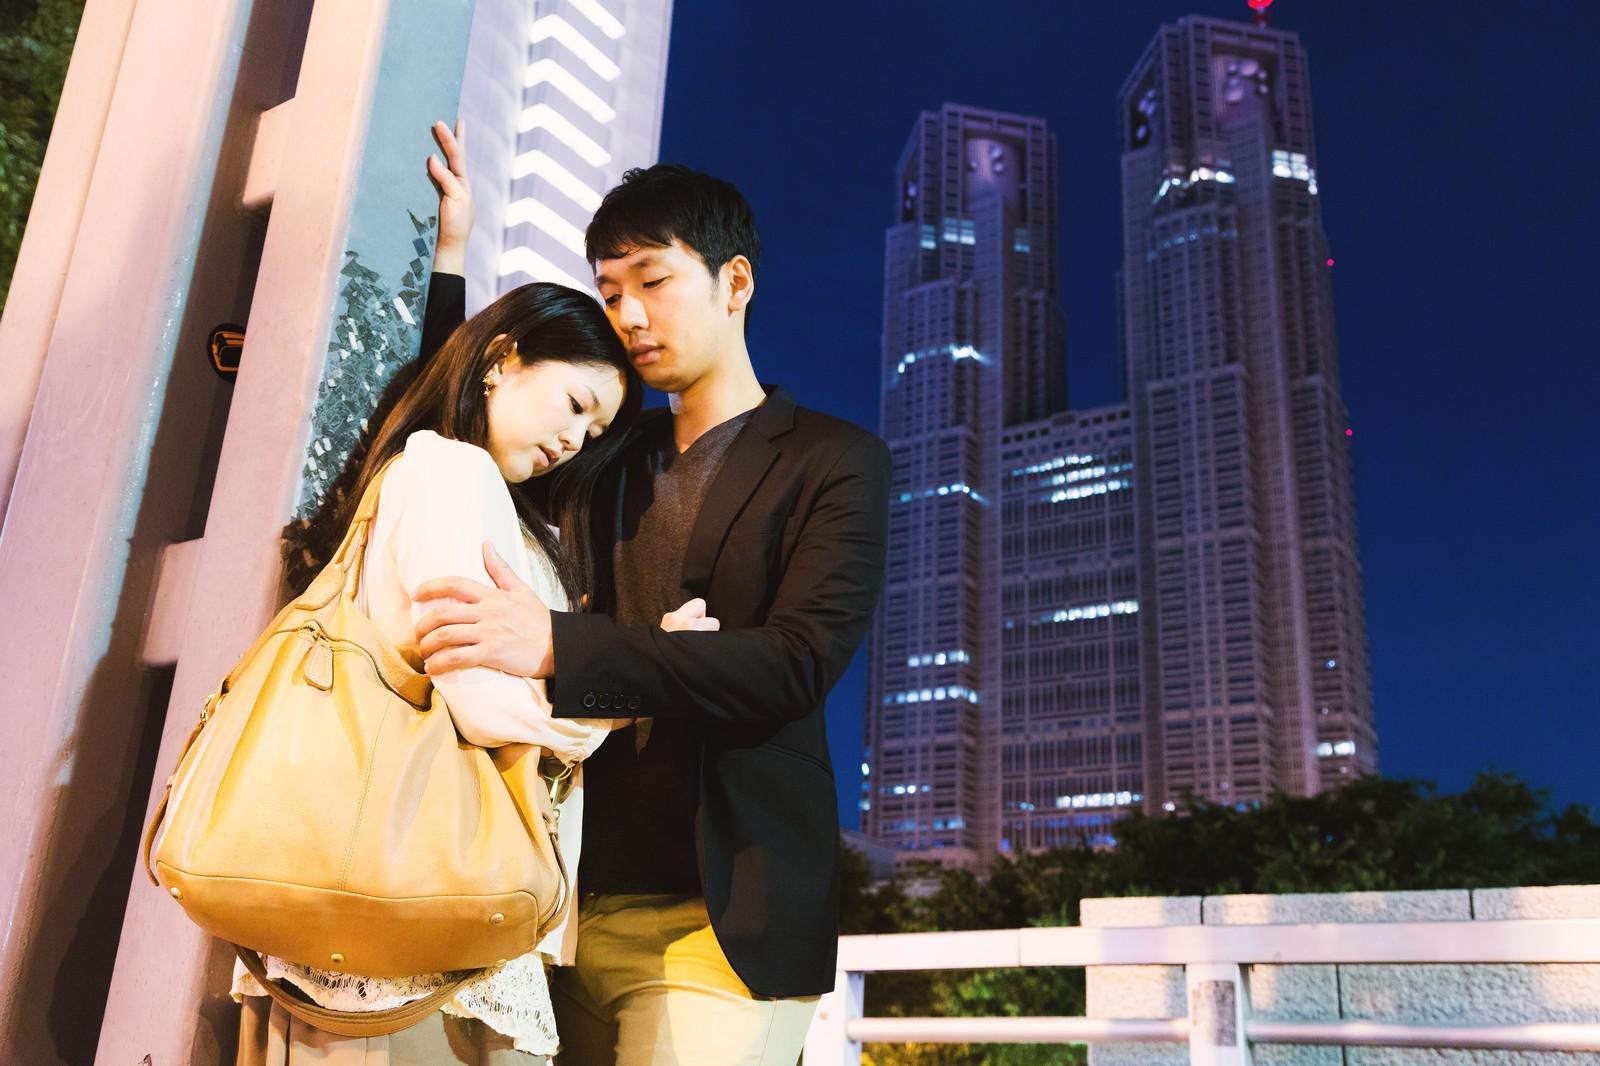 IBJの婚活パーティーでカップリング率を高める方法【実体験の失敗と改善策を教えます】